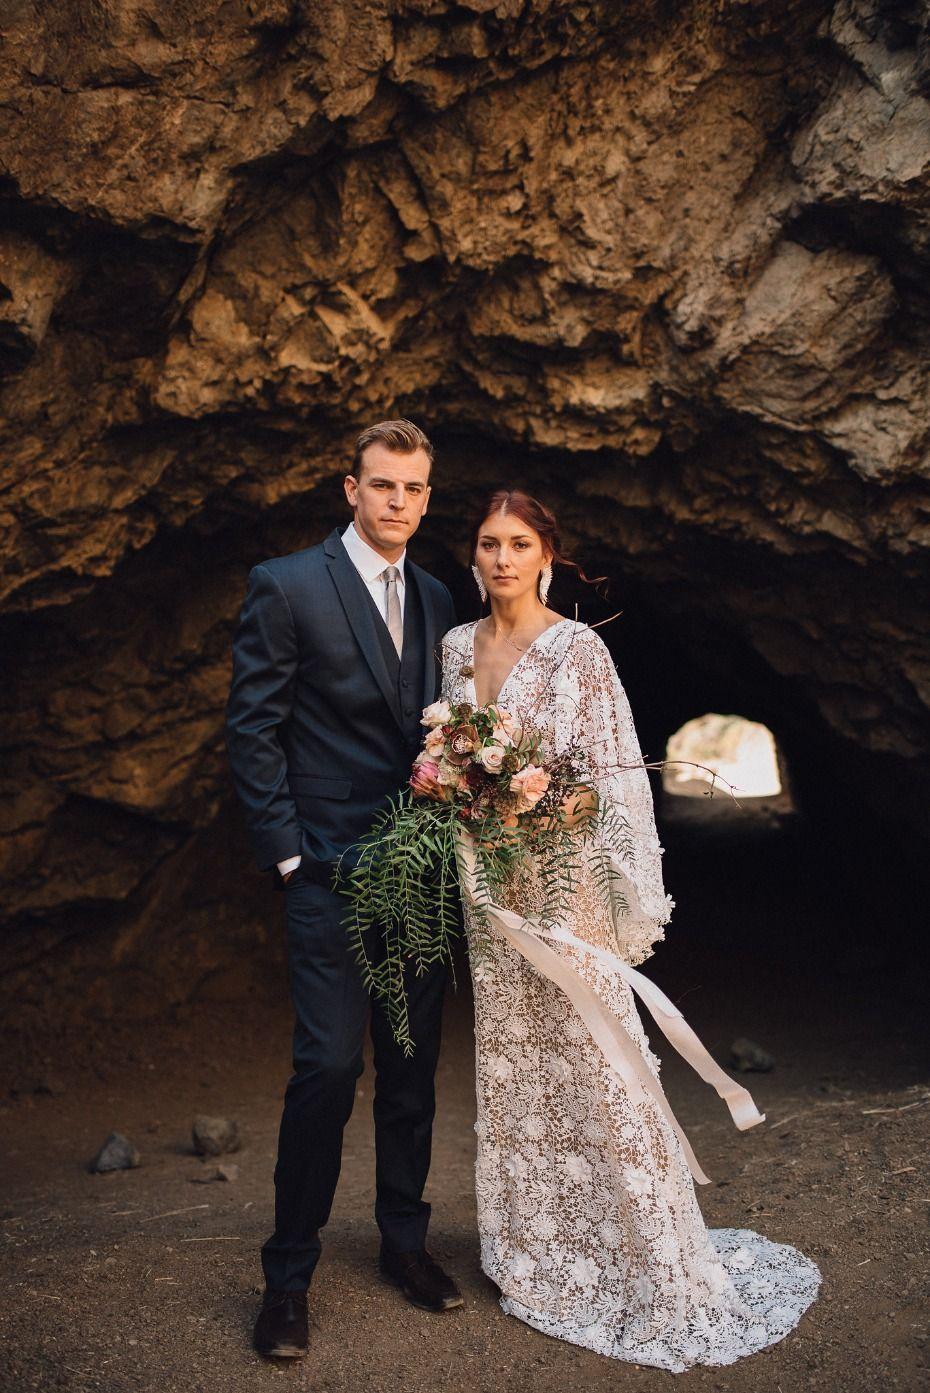 Romantic hollywood bohemian inspiration at the bronson canyon caves